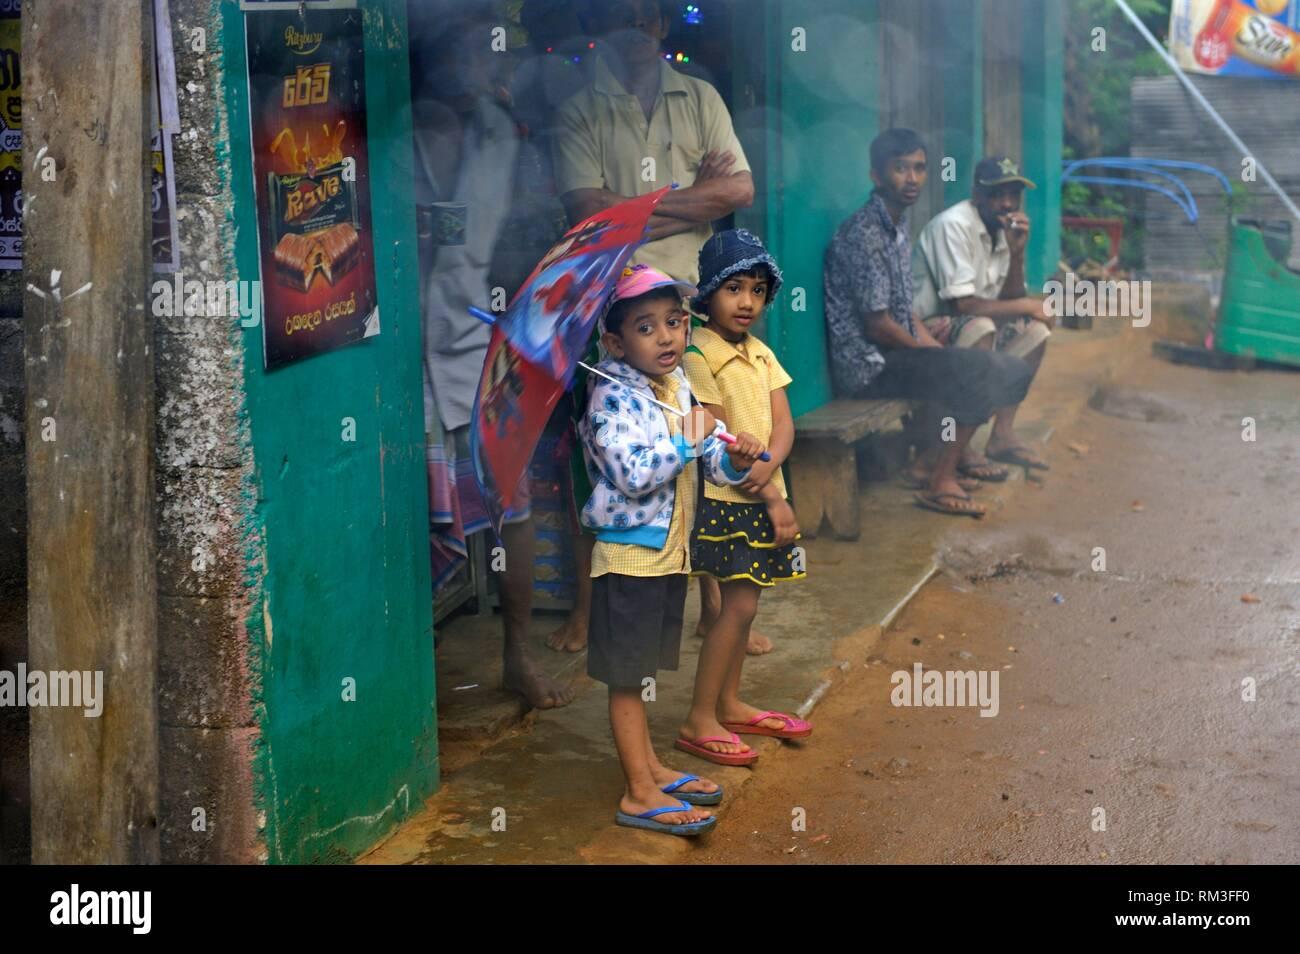 Sri Lanka, Indischer Subkontinent, Südasien. Stockbild